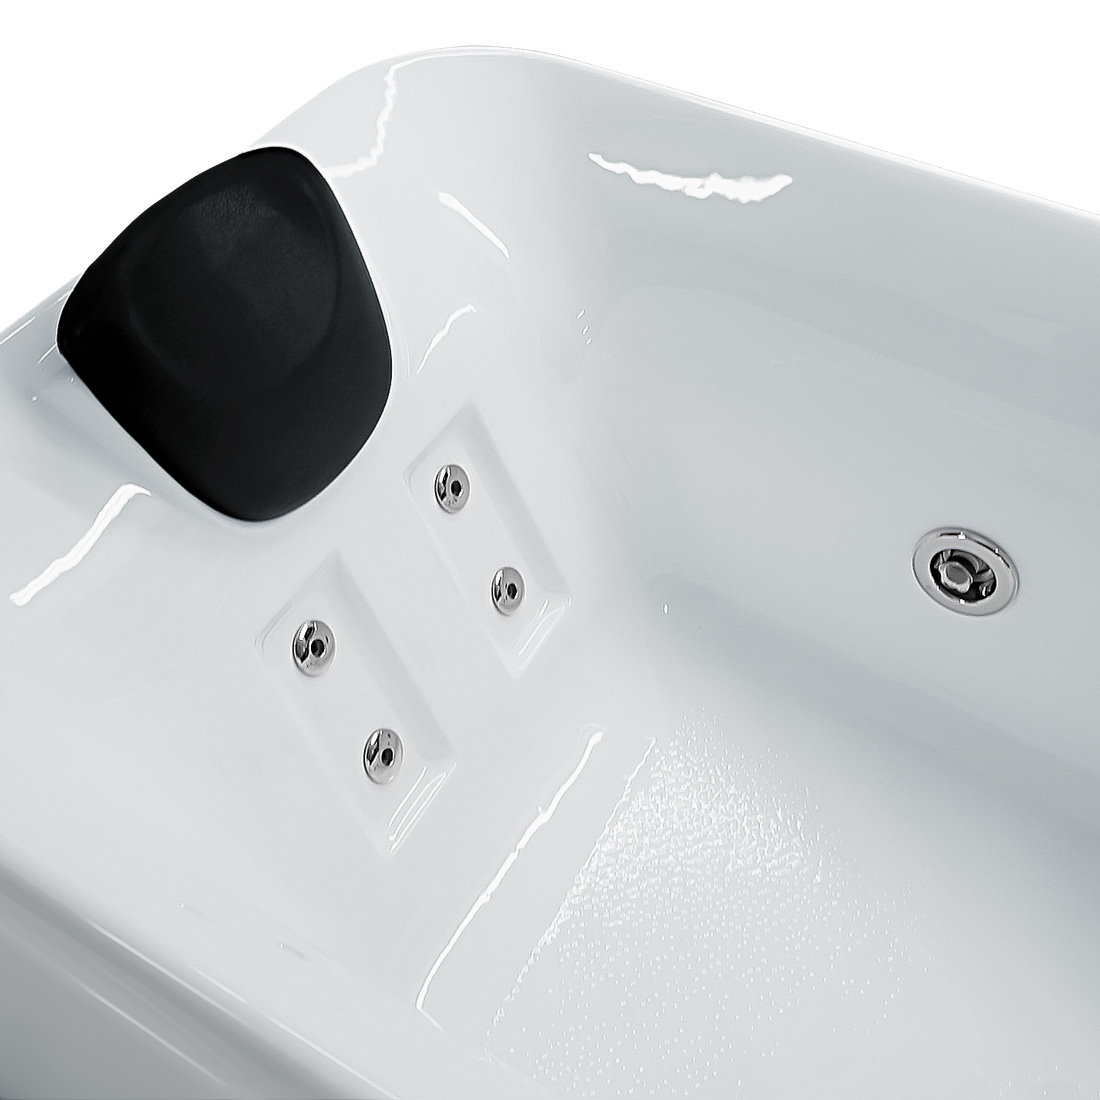 whirlpool vollausstattung pool badewanne wanne a1149n pl 170x80cm. Black Bedroom Furniture Sets. Home Design Ideas